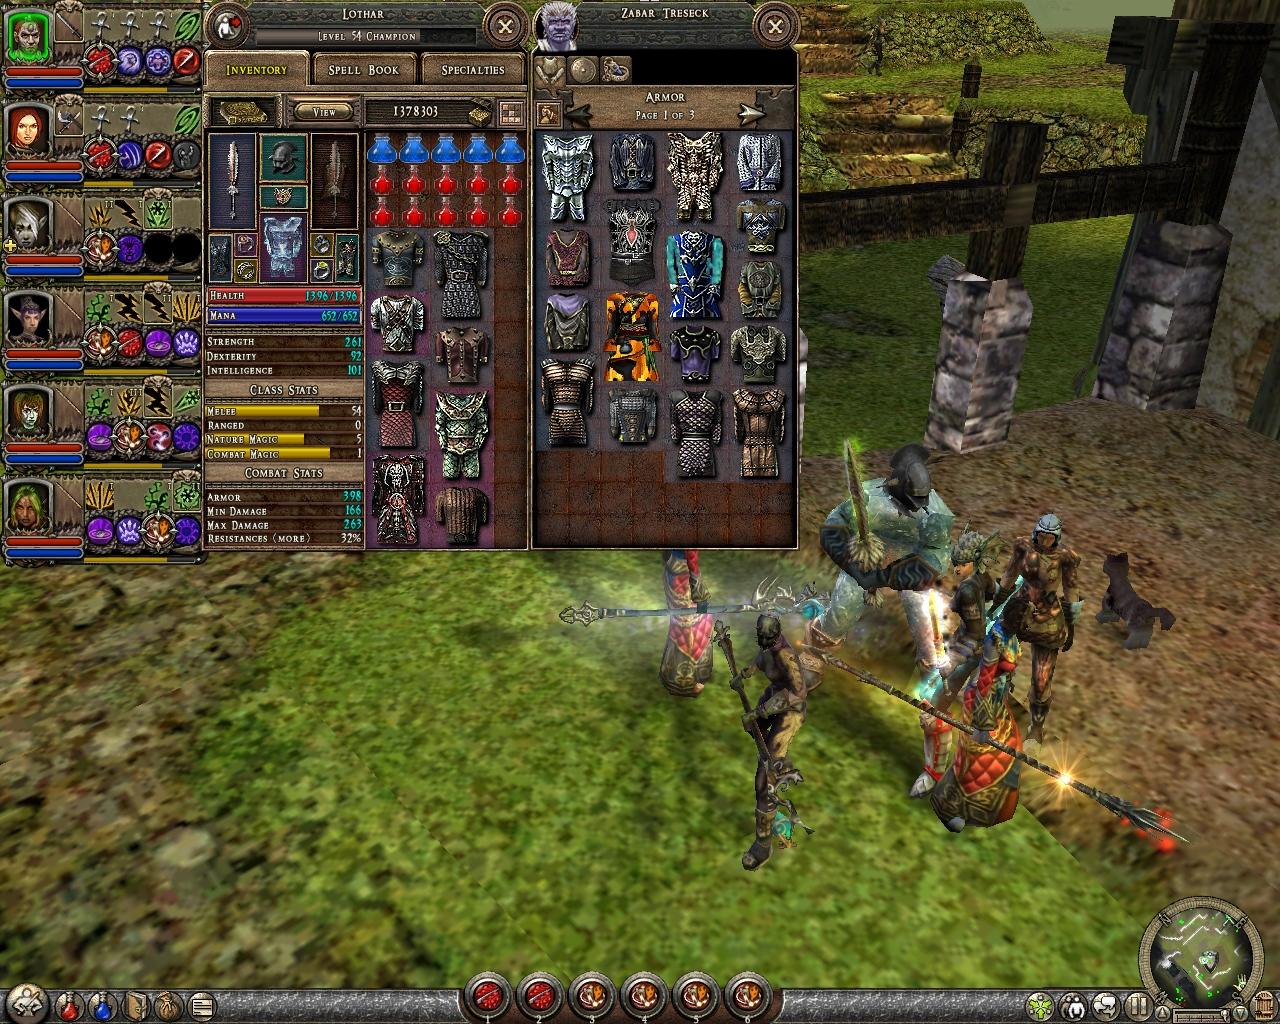 dungeon_siege_ii_screen_0014.jpg